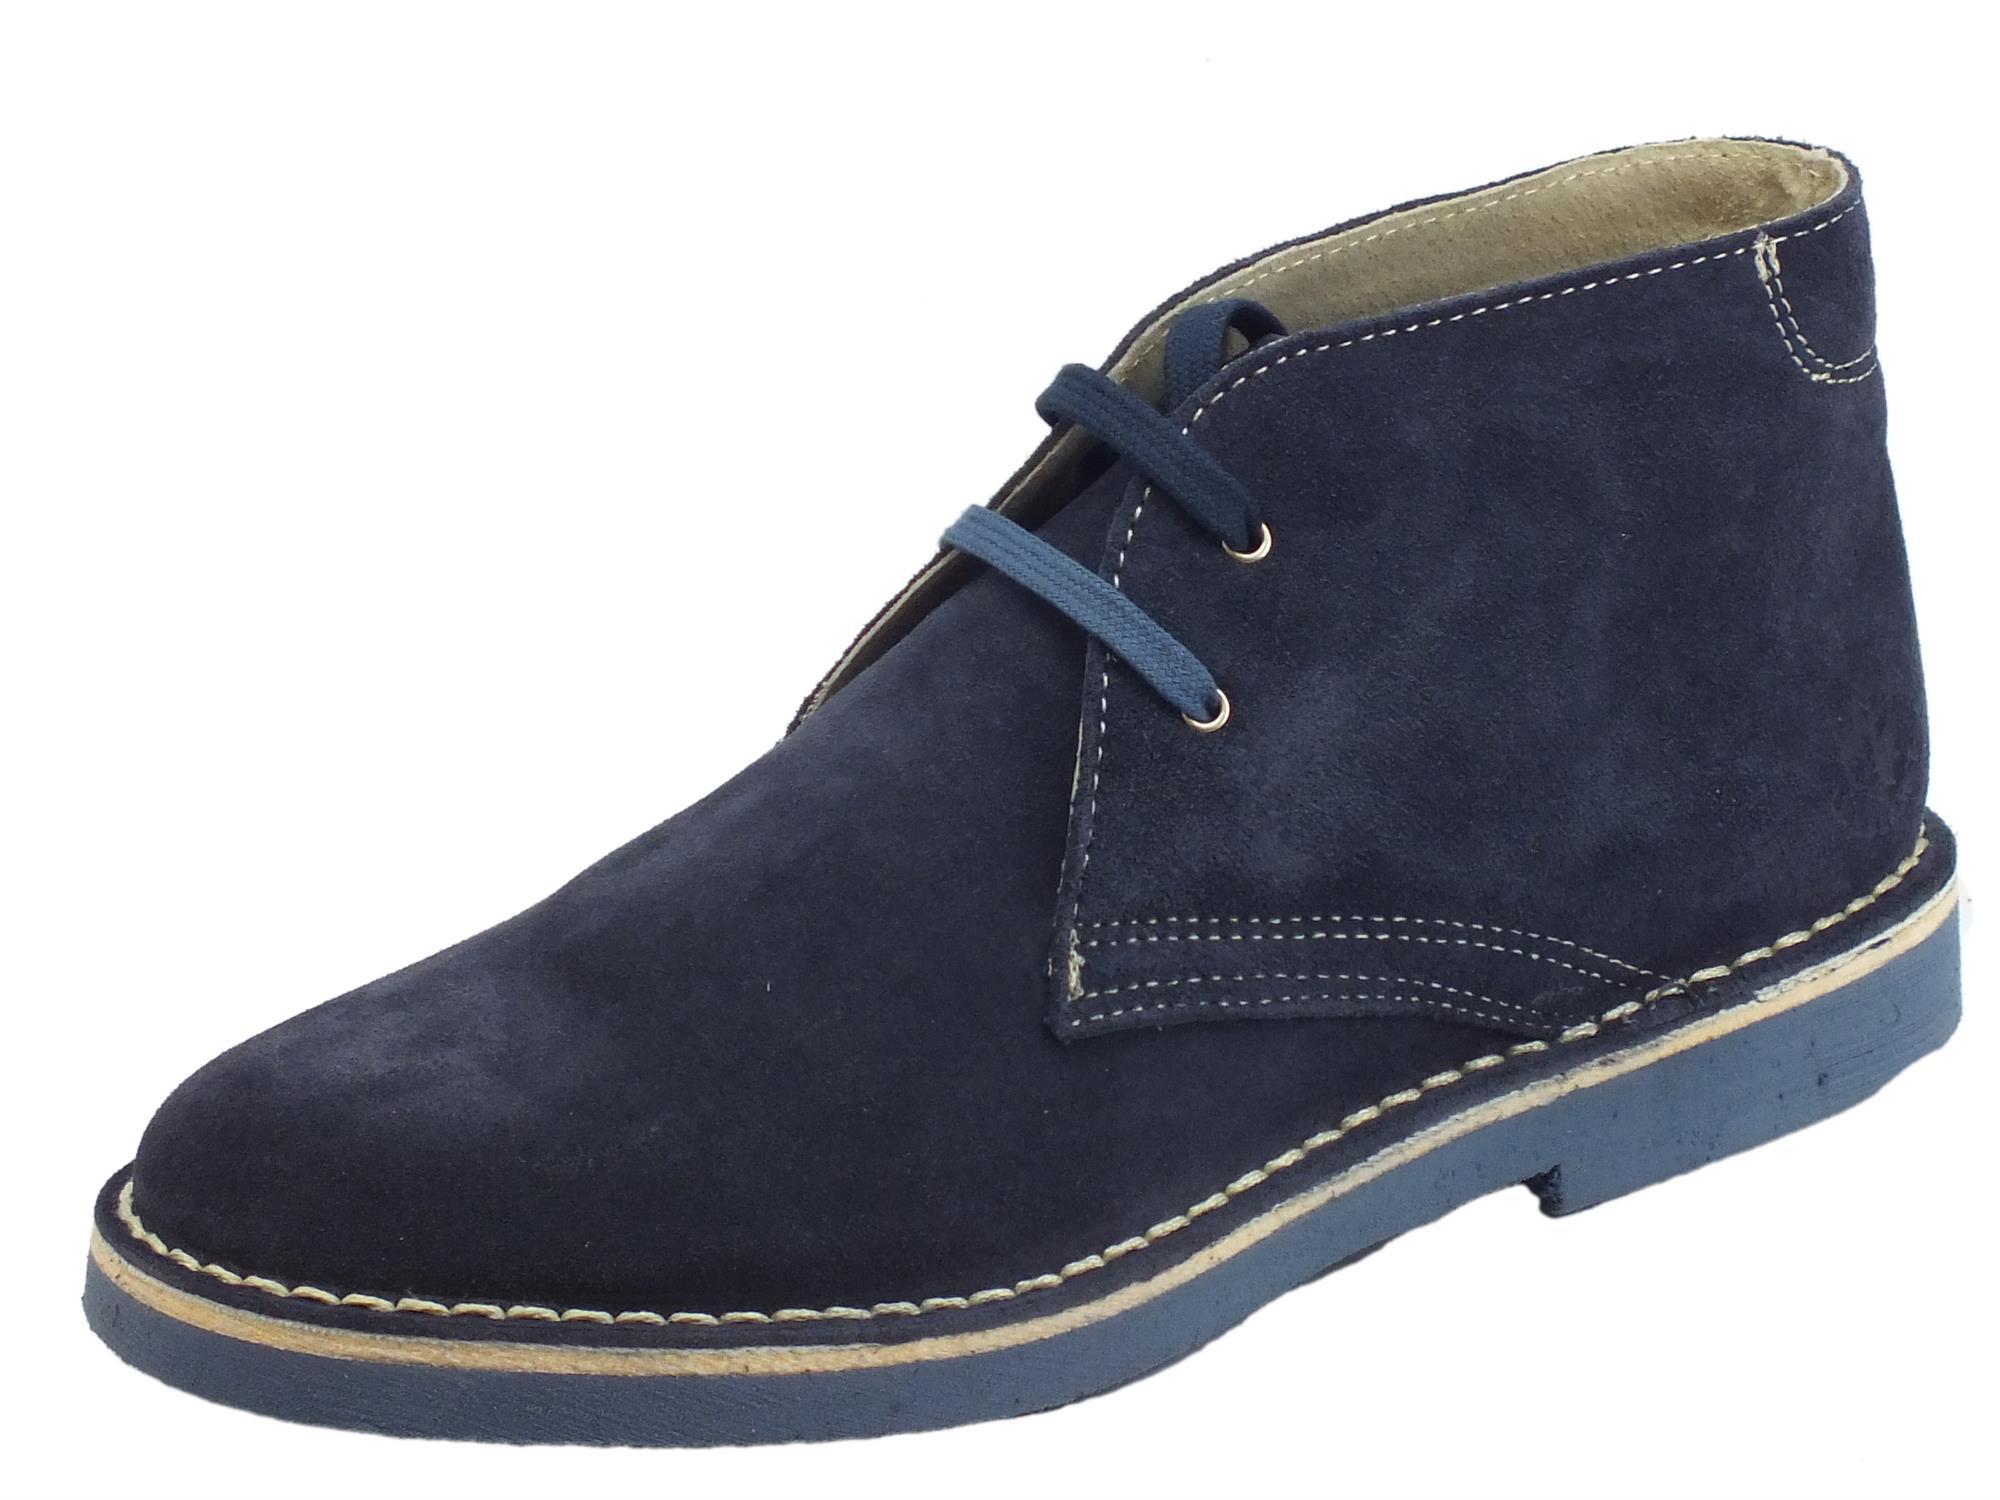 Lumberjack Gable scarpe polacchine uomo camoscio jeans ed - Vitiello ... 08e34c0b4e8